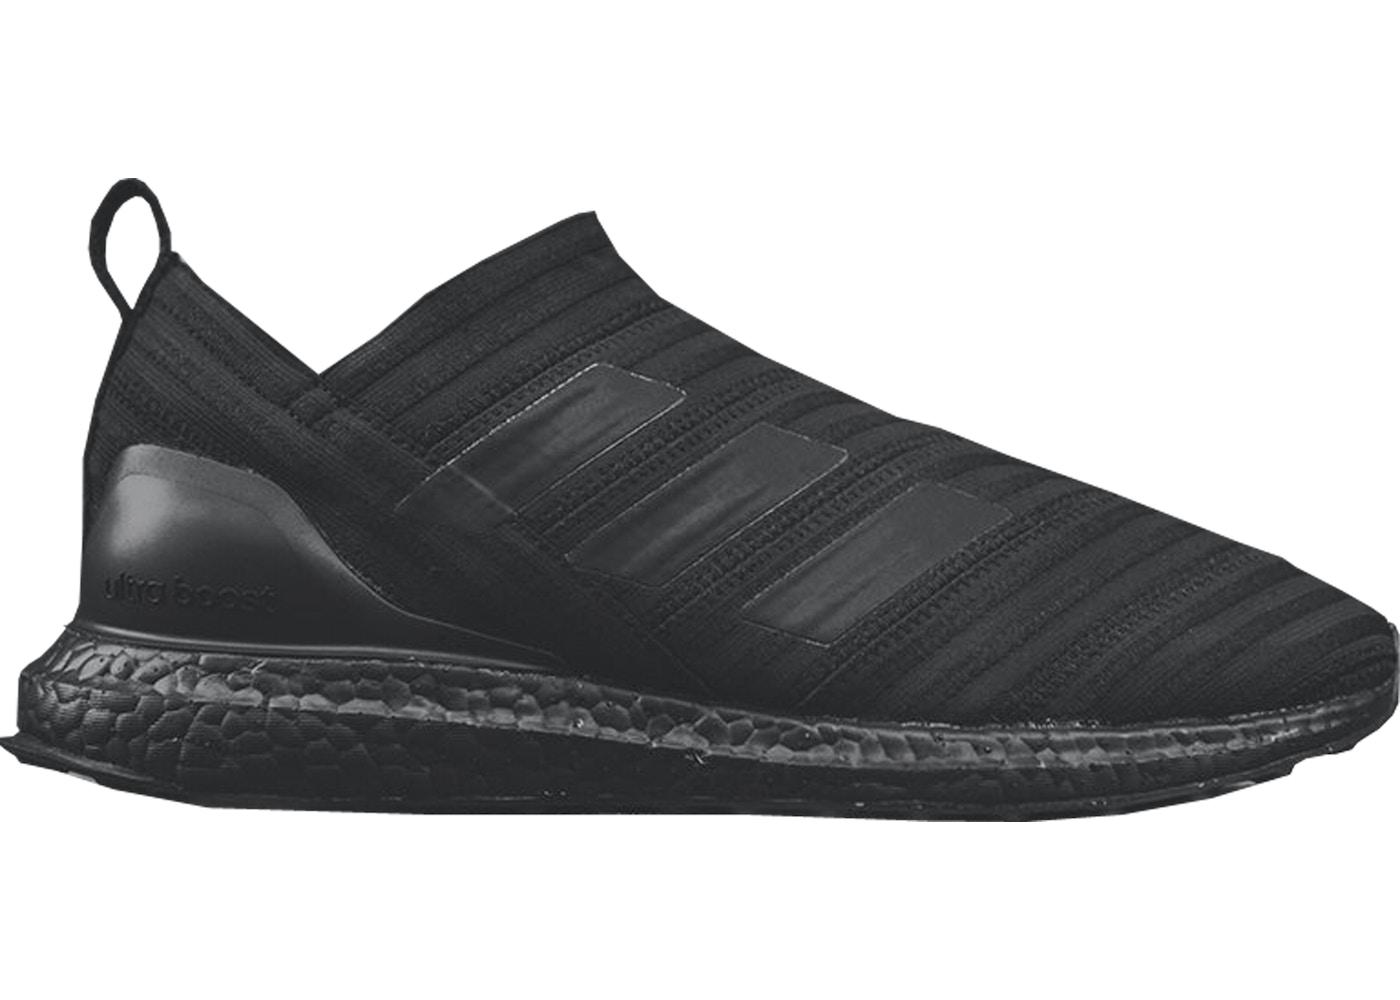 f876e5ba6 adidas Ultra Boost Size 9 Shoes - New Highest Bids